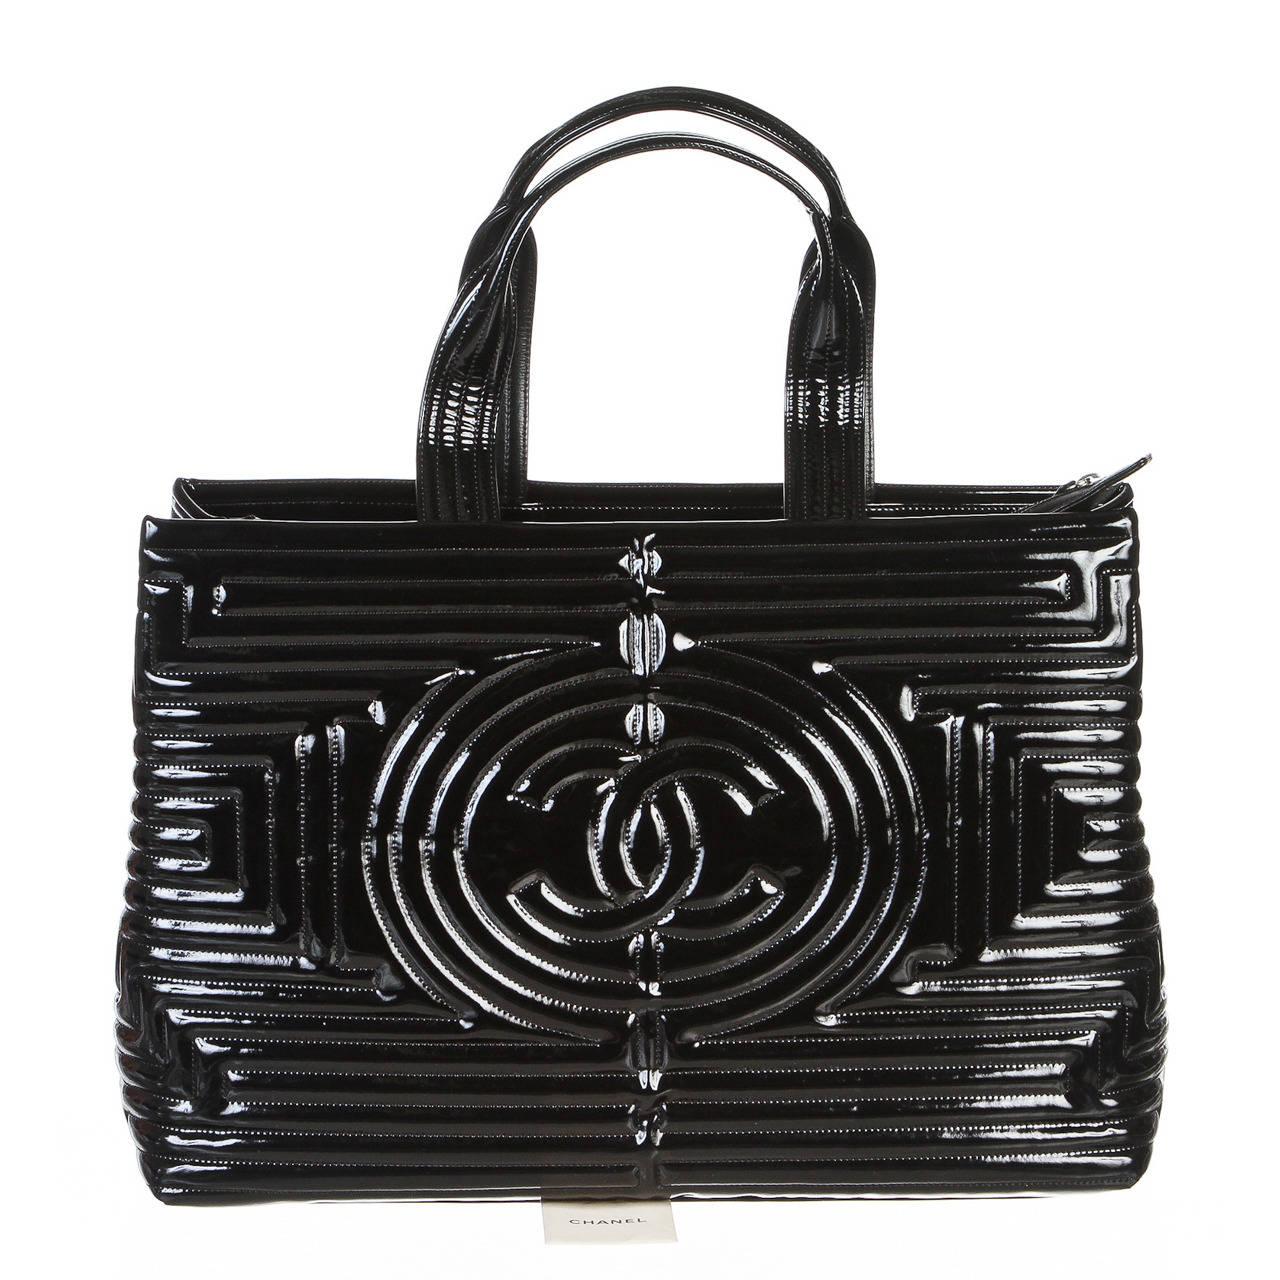 chanel black vinyl coco ming grand shopping tote handbag at 1stdibs. Black Bedroom Furniture Sets. Home Design Ideas